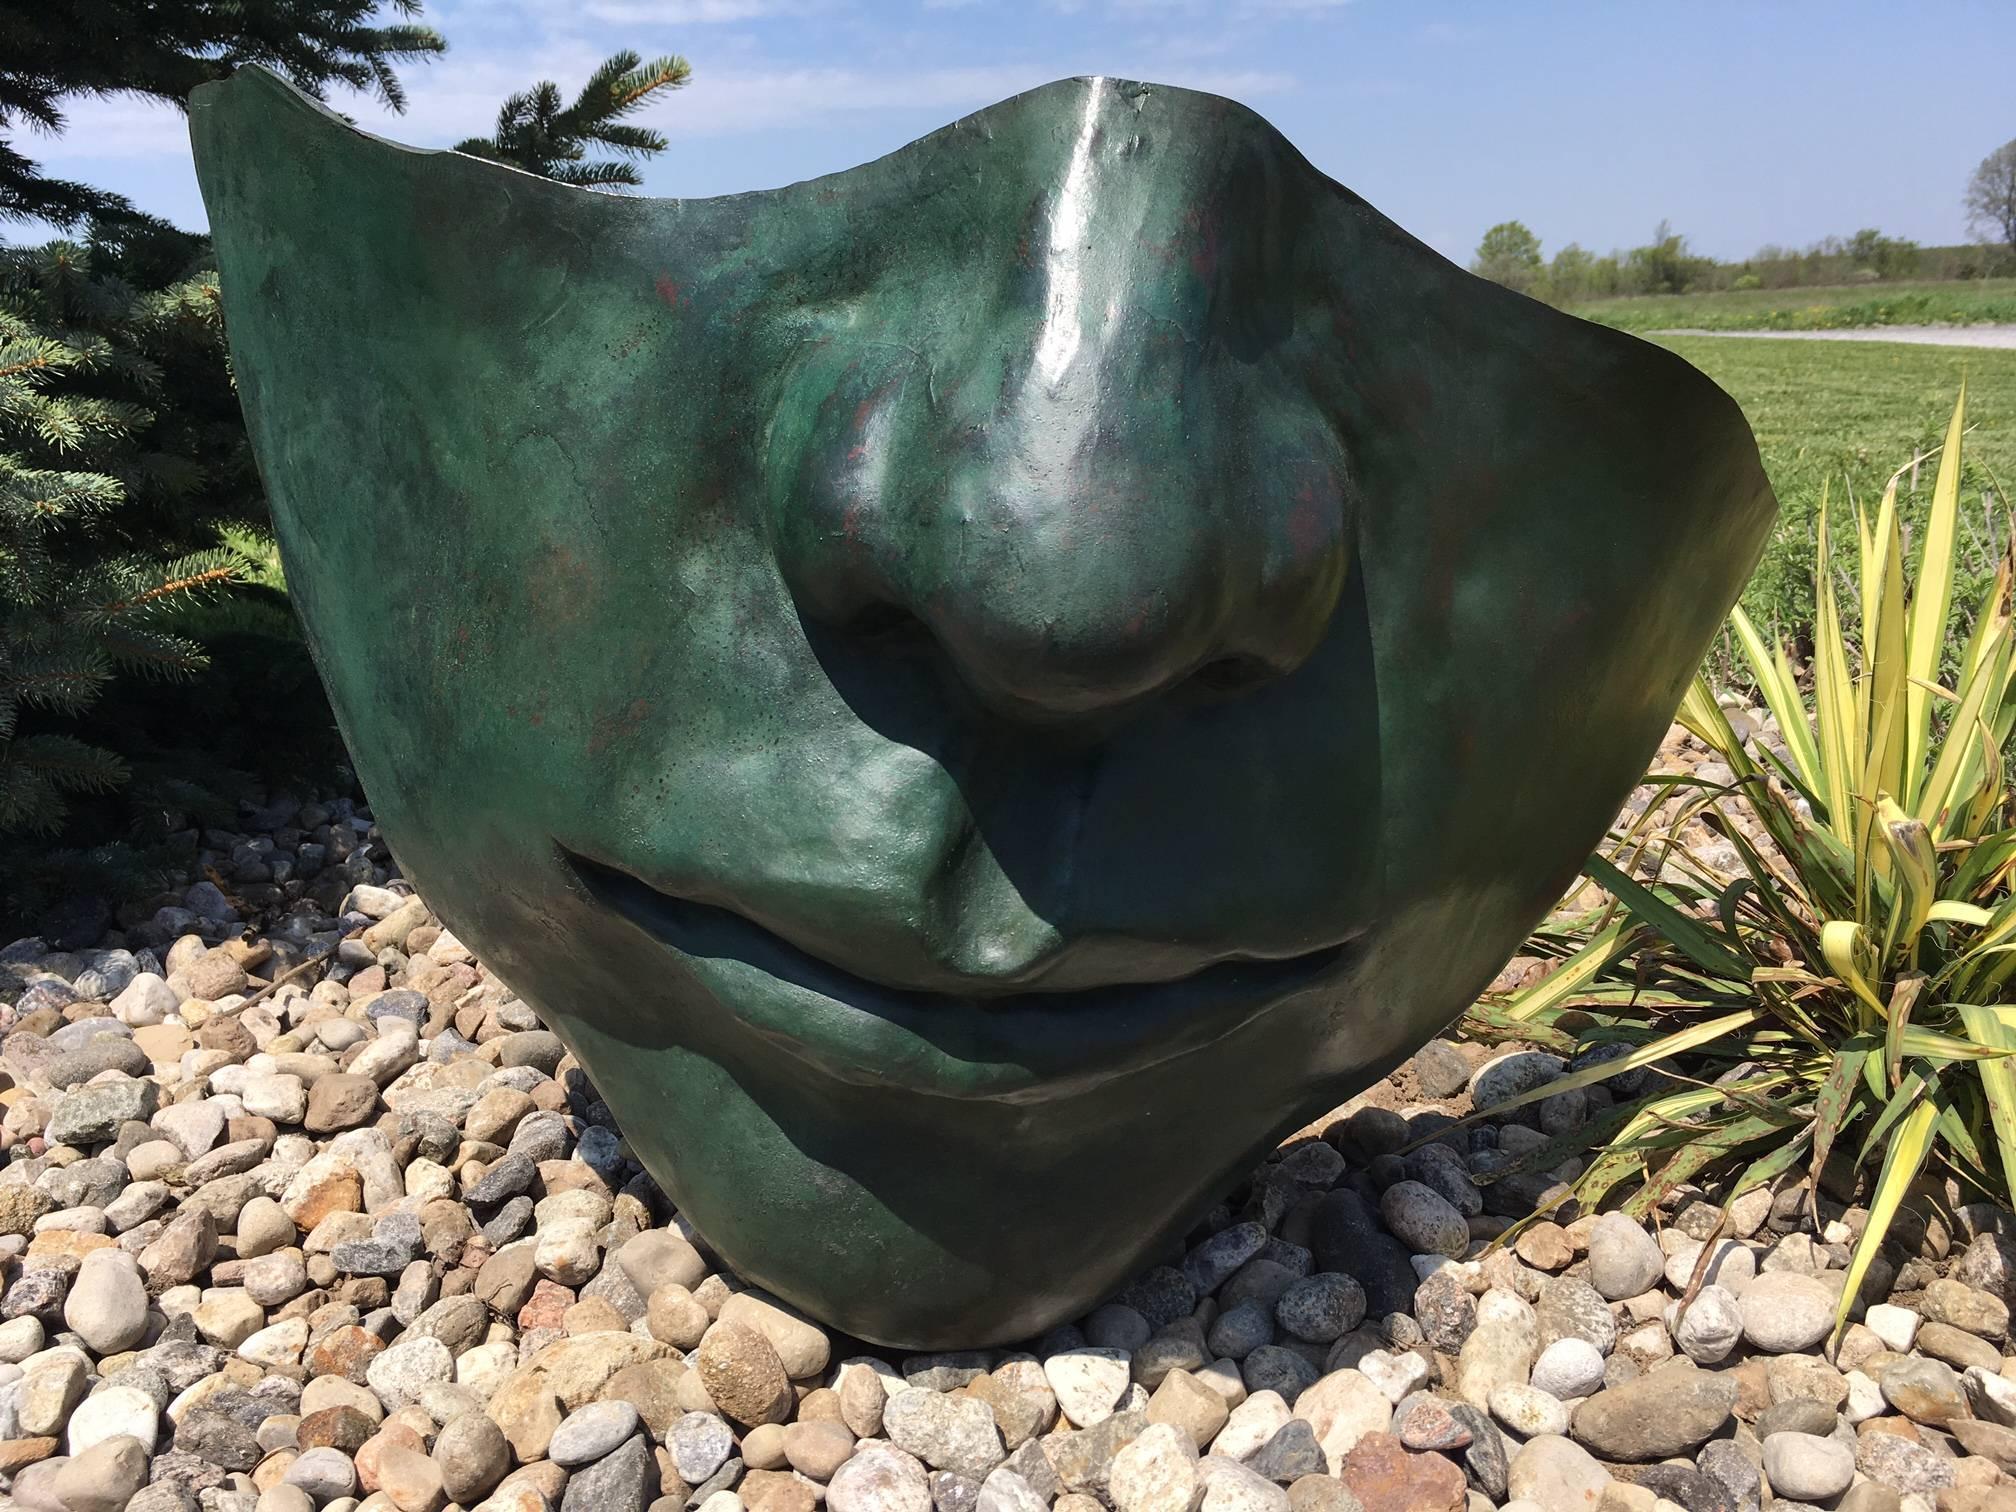 Head to Ear 2 - large, figurative, narrative, bronze outdoor sculpture